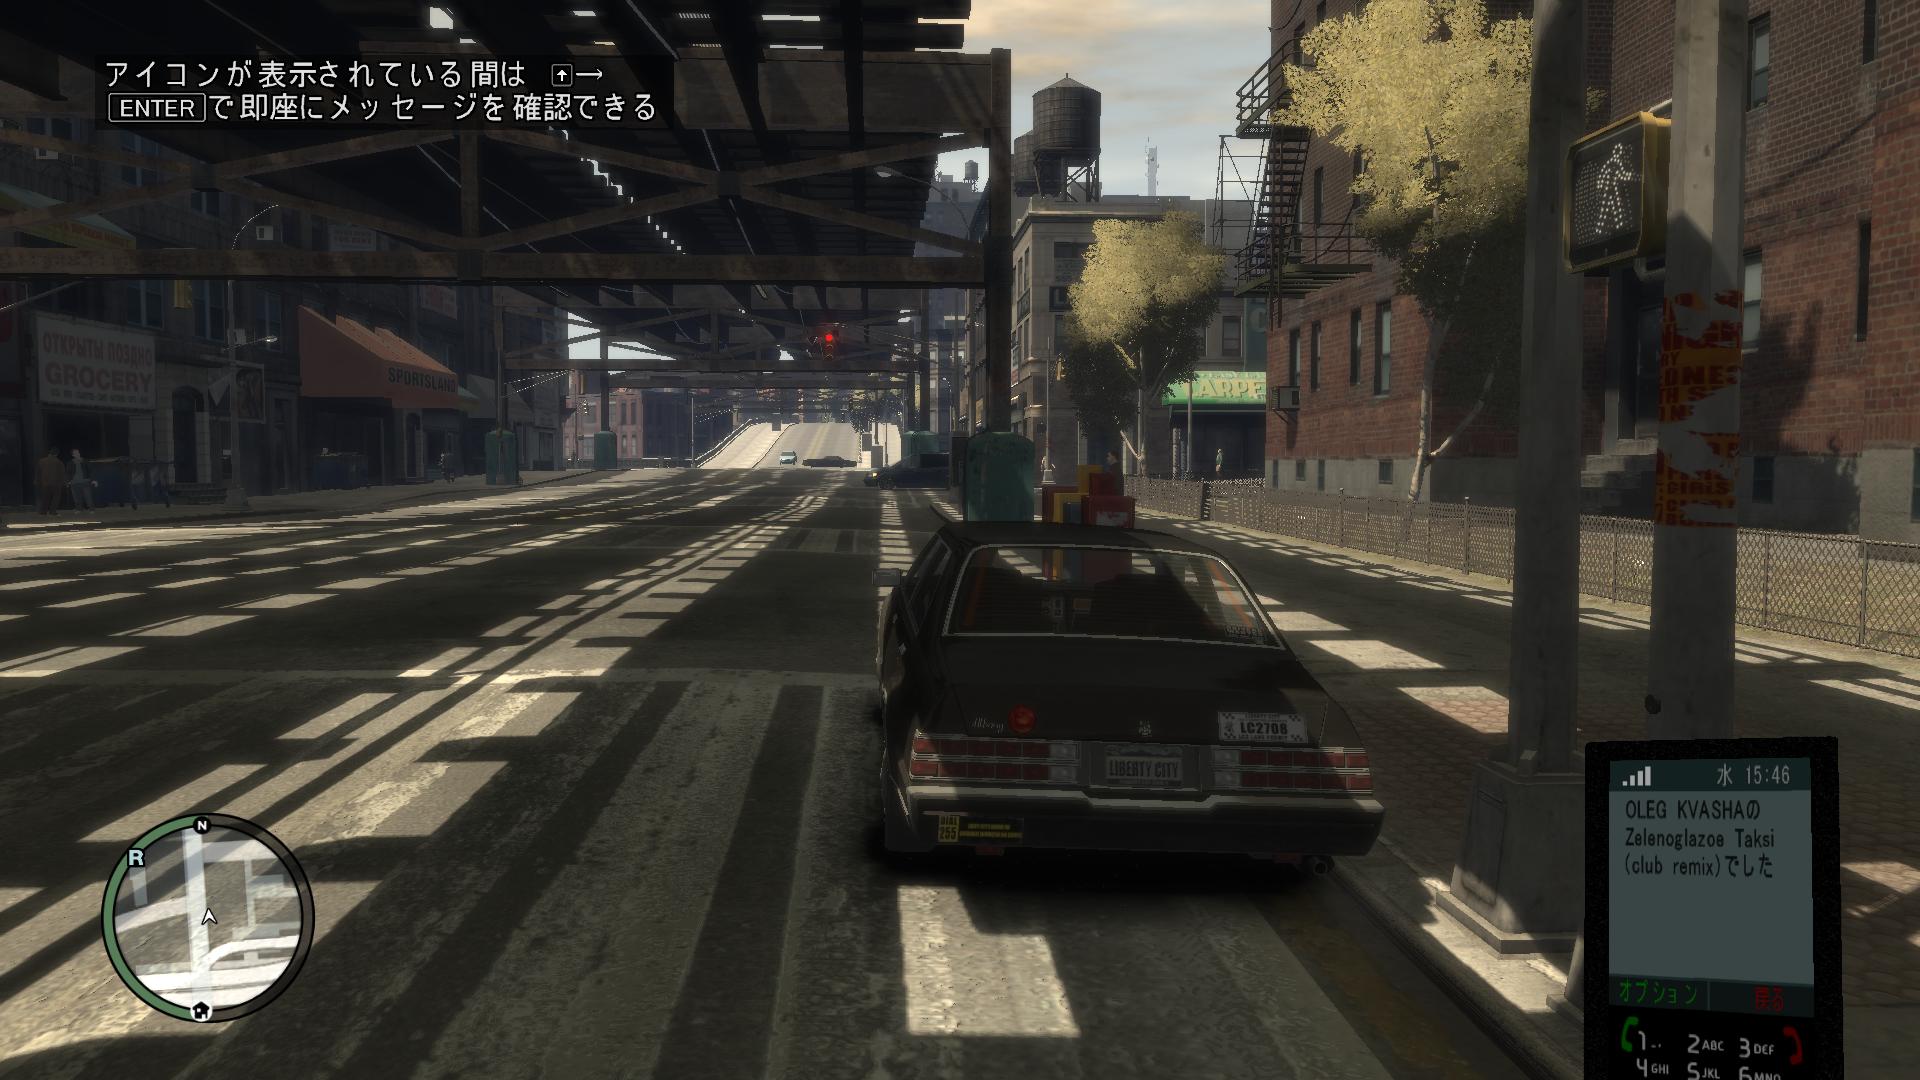 Grand_Theft_Auto_4_Screenshot_2020.04.20